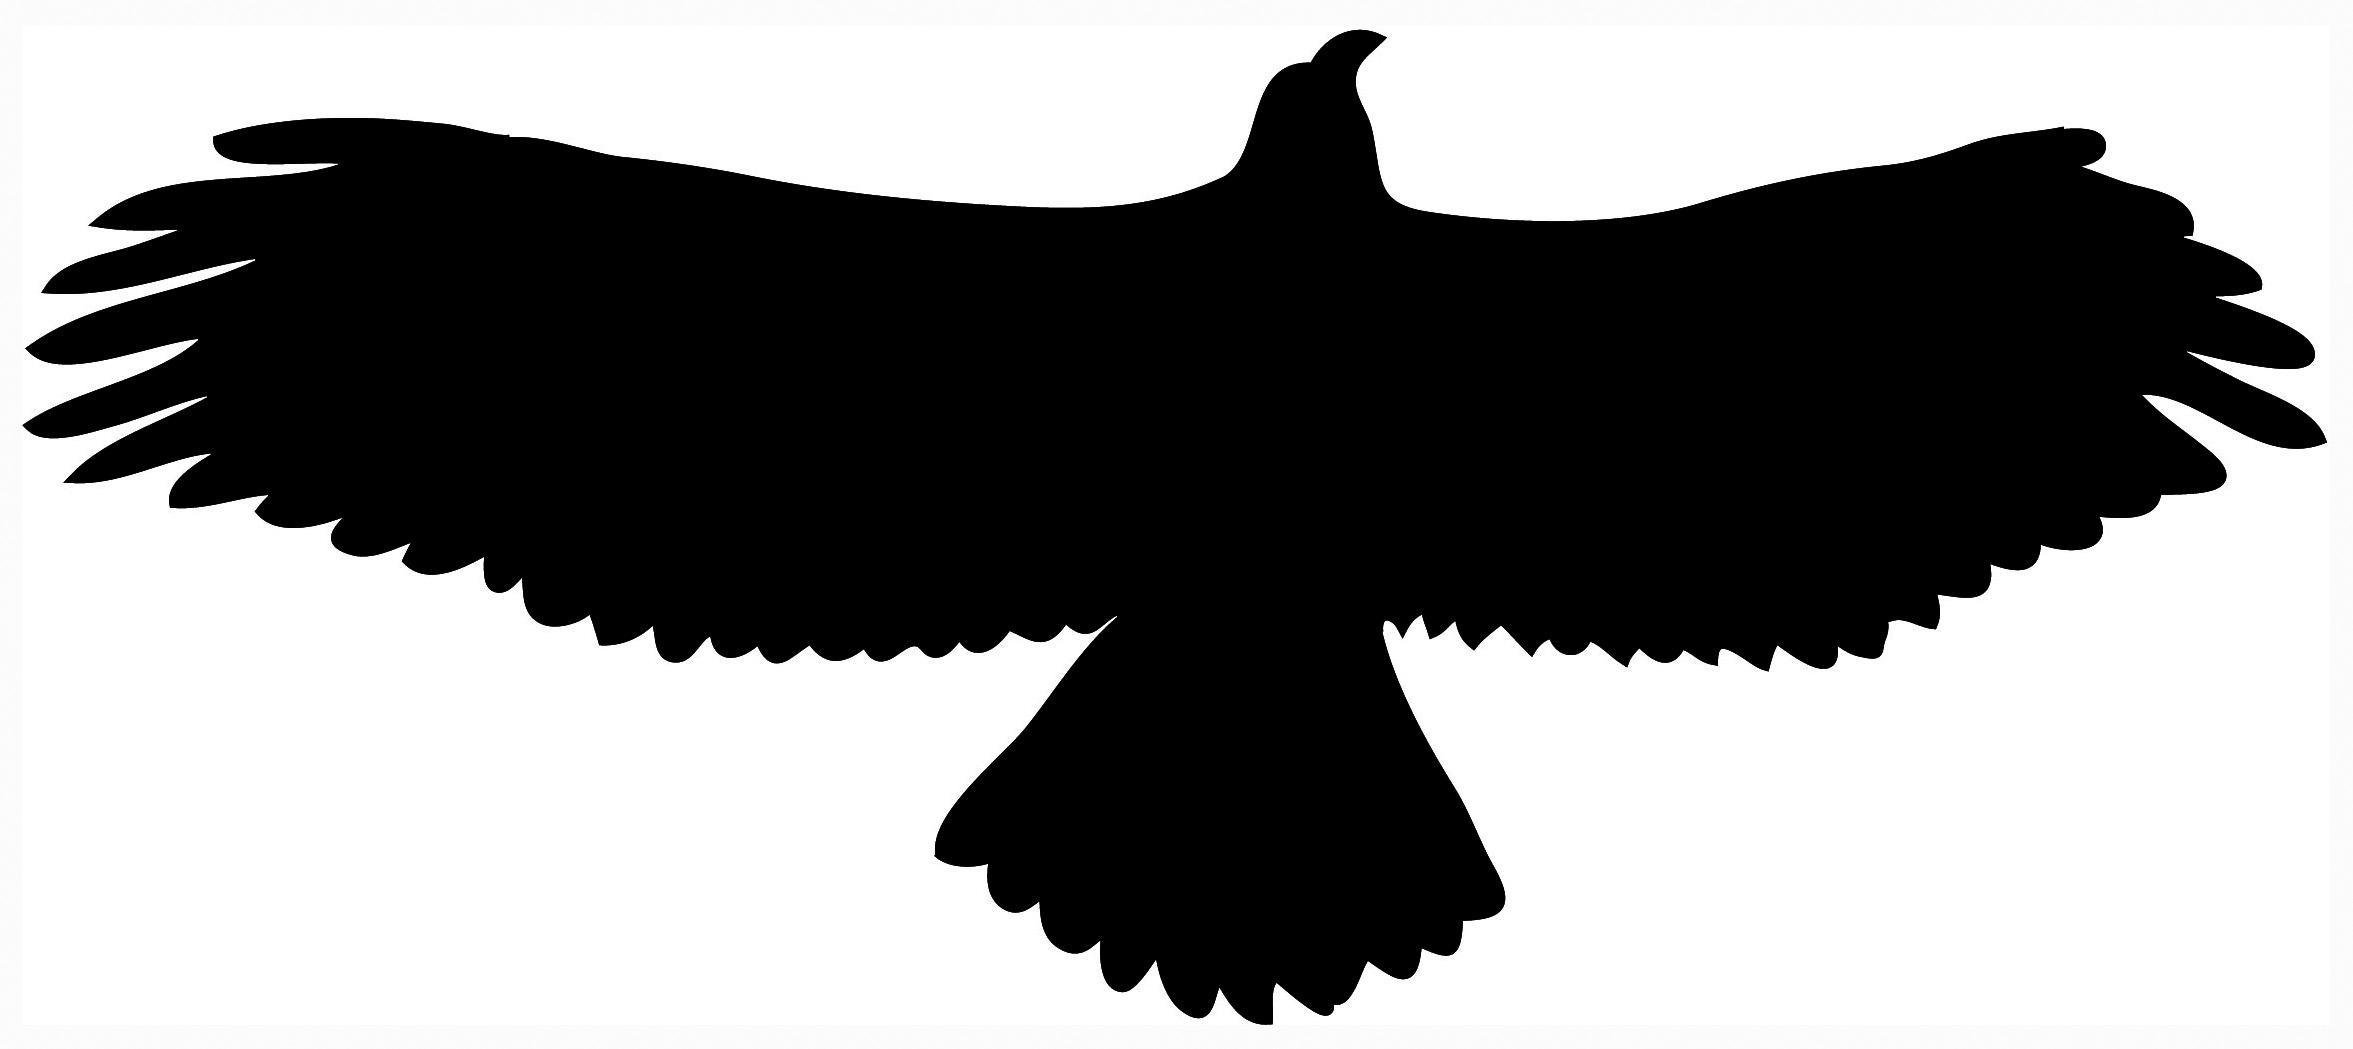 2353x1049 Bird Silhouette Clip Art Free, Free Bird Silhouette Clip Art Free